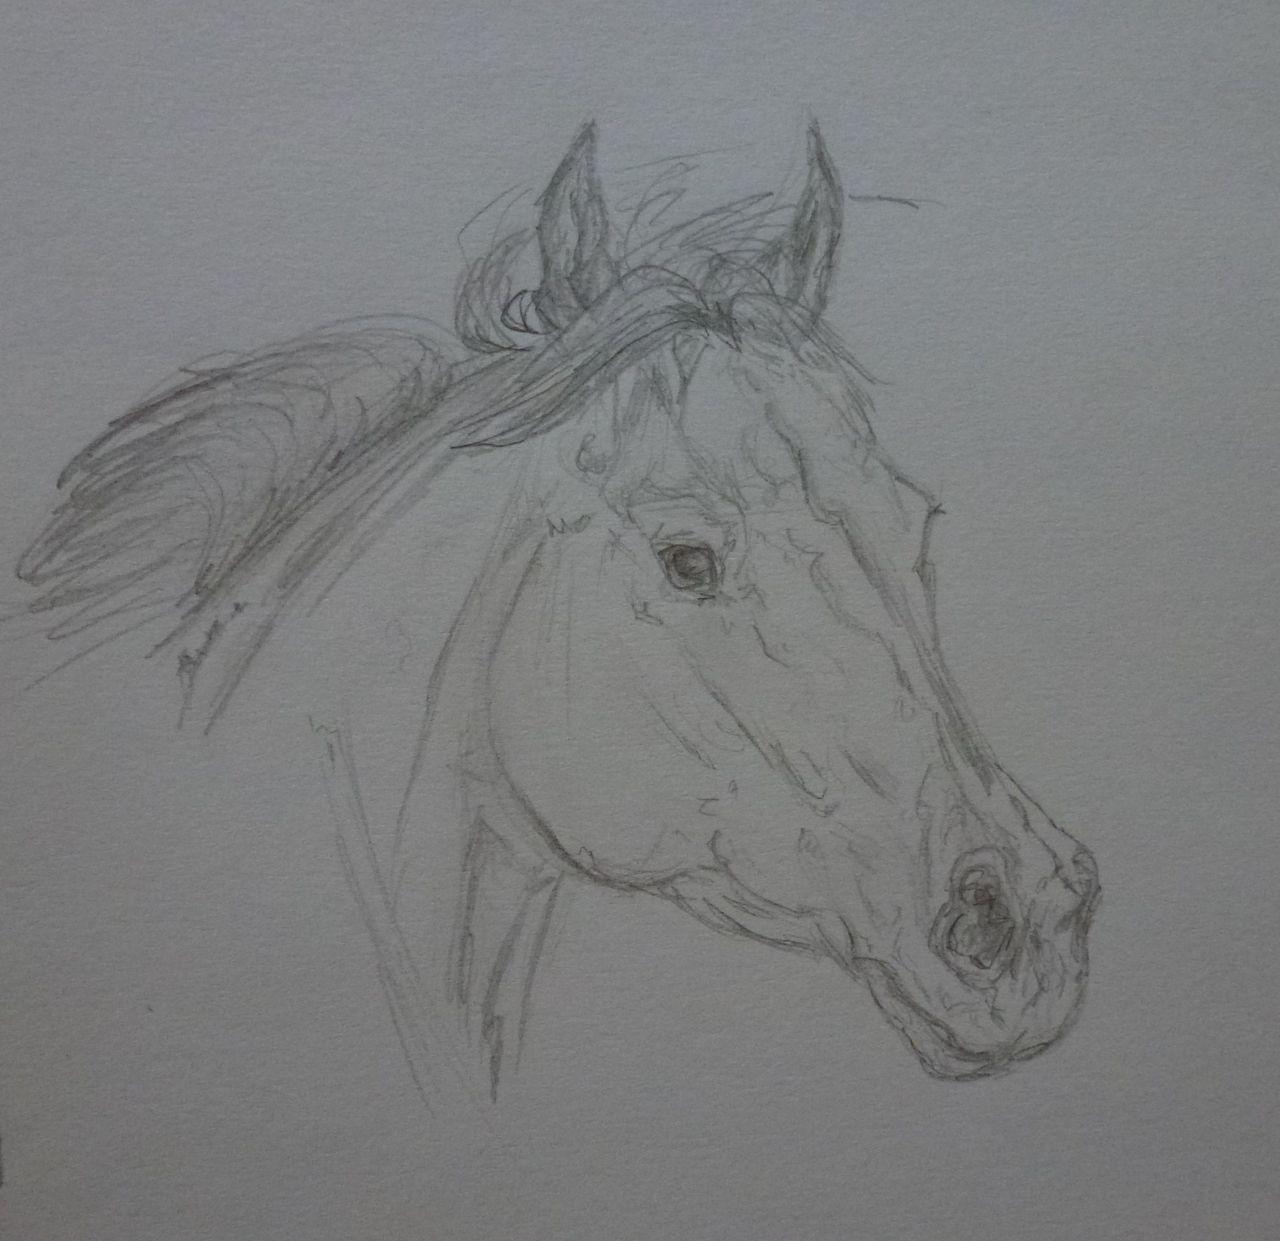 Pferdekopf Skizze, Araber-mix